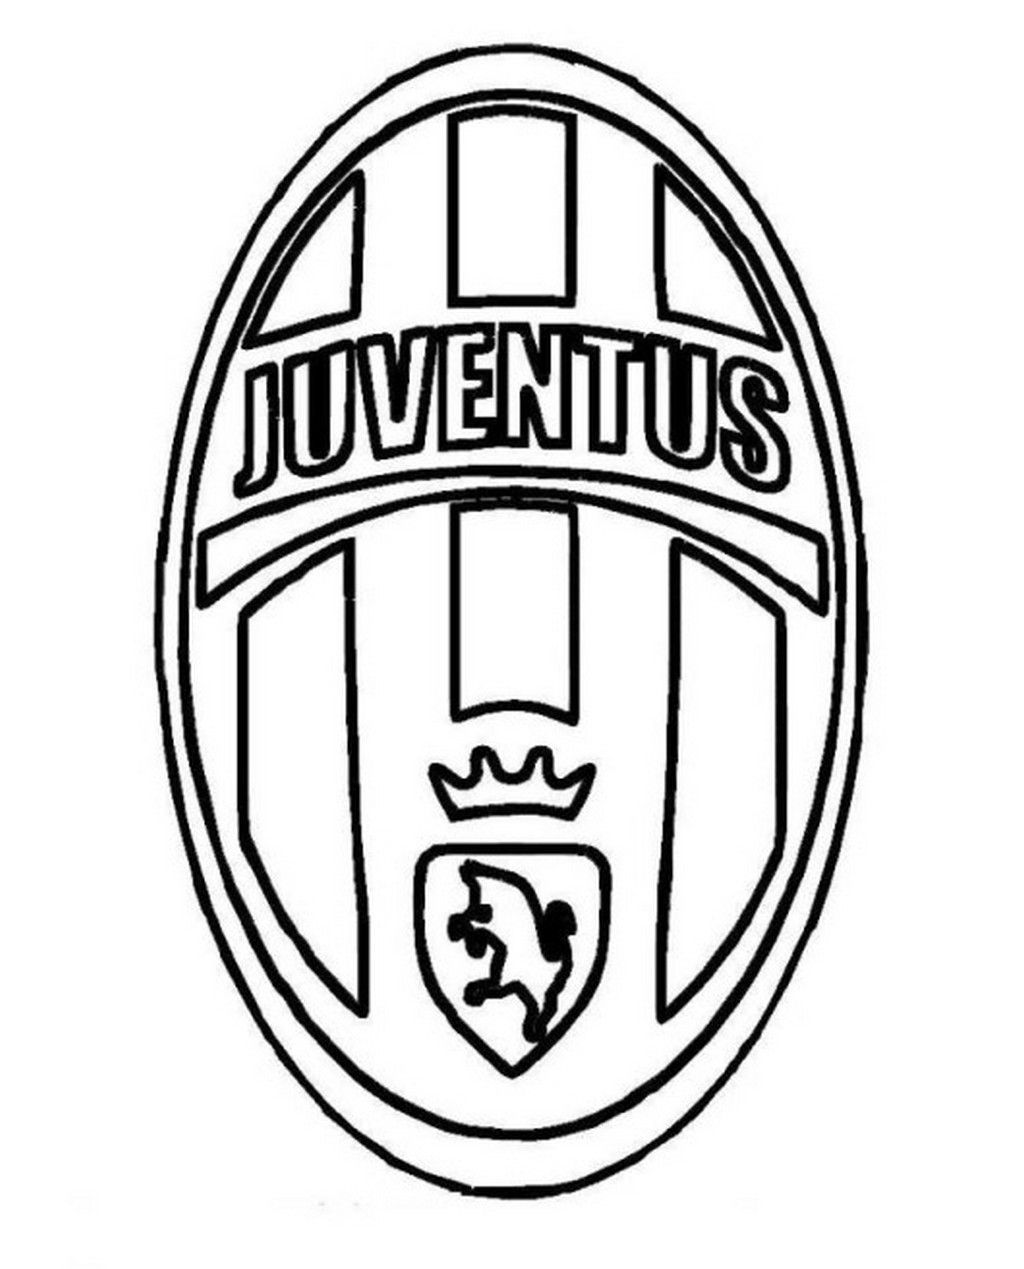 Juventus Fc Logo Google Search Logos Coloring Pages Soccer